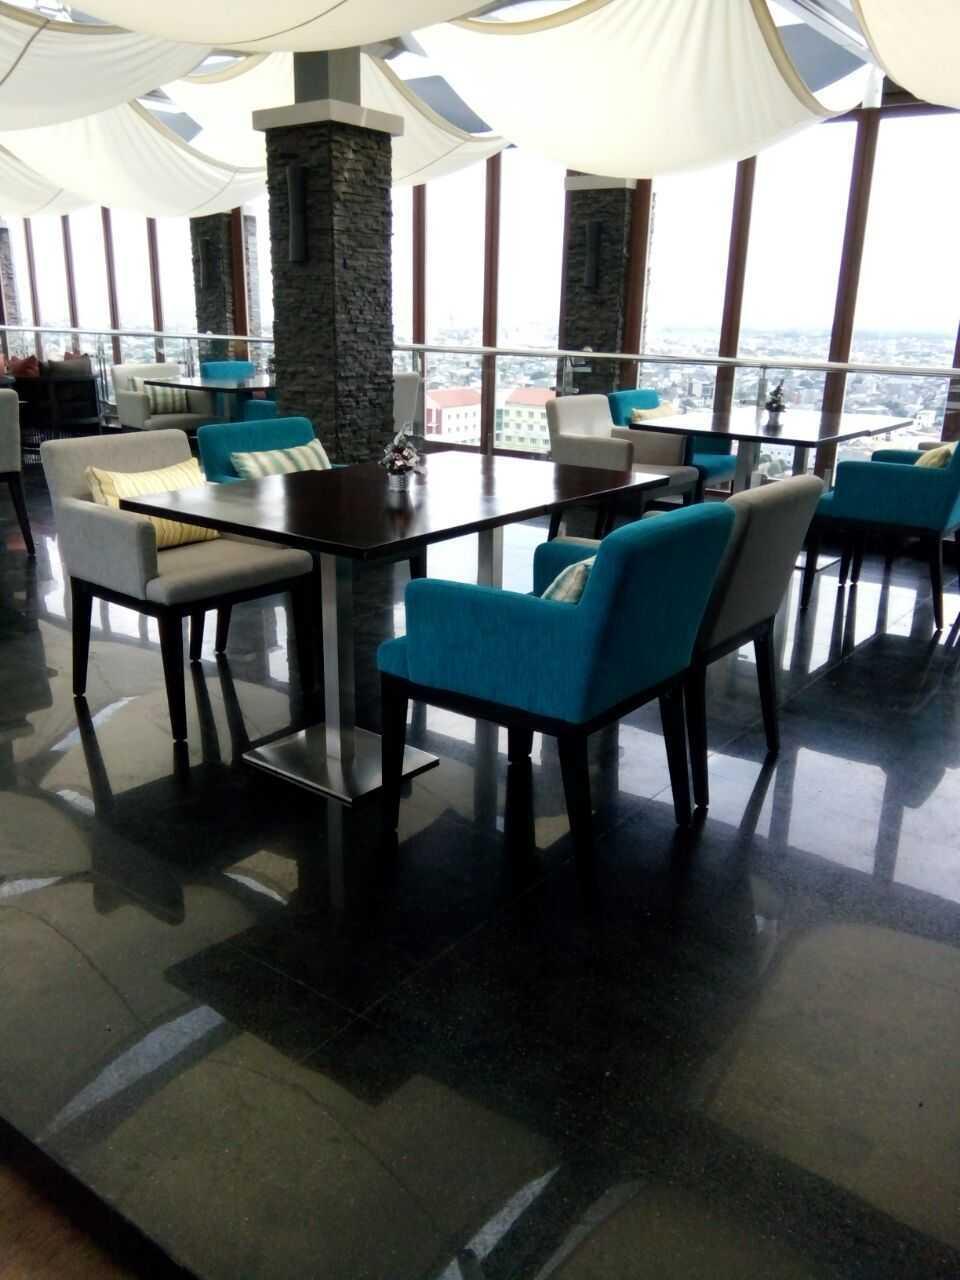 Rdesign Sky Dinning Makssar The Society Makassar Makassar Img-20170119-Wa0004   27500